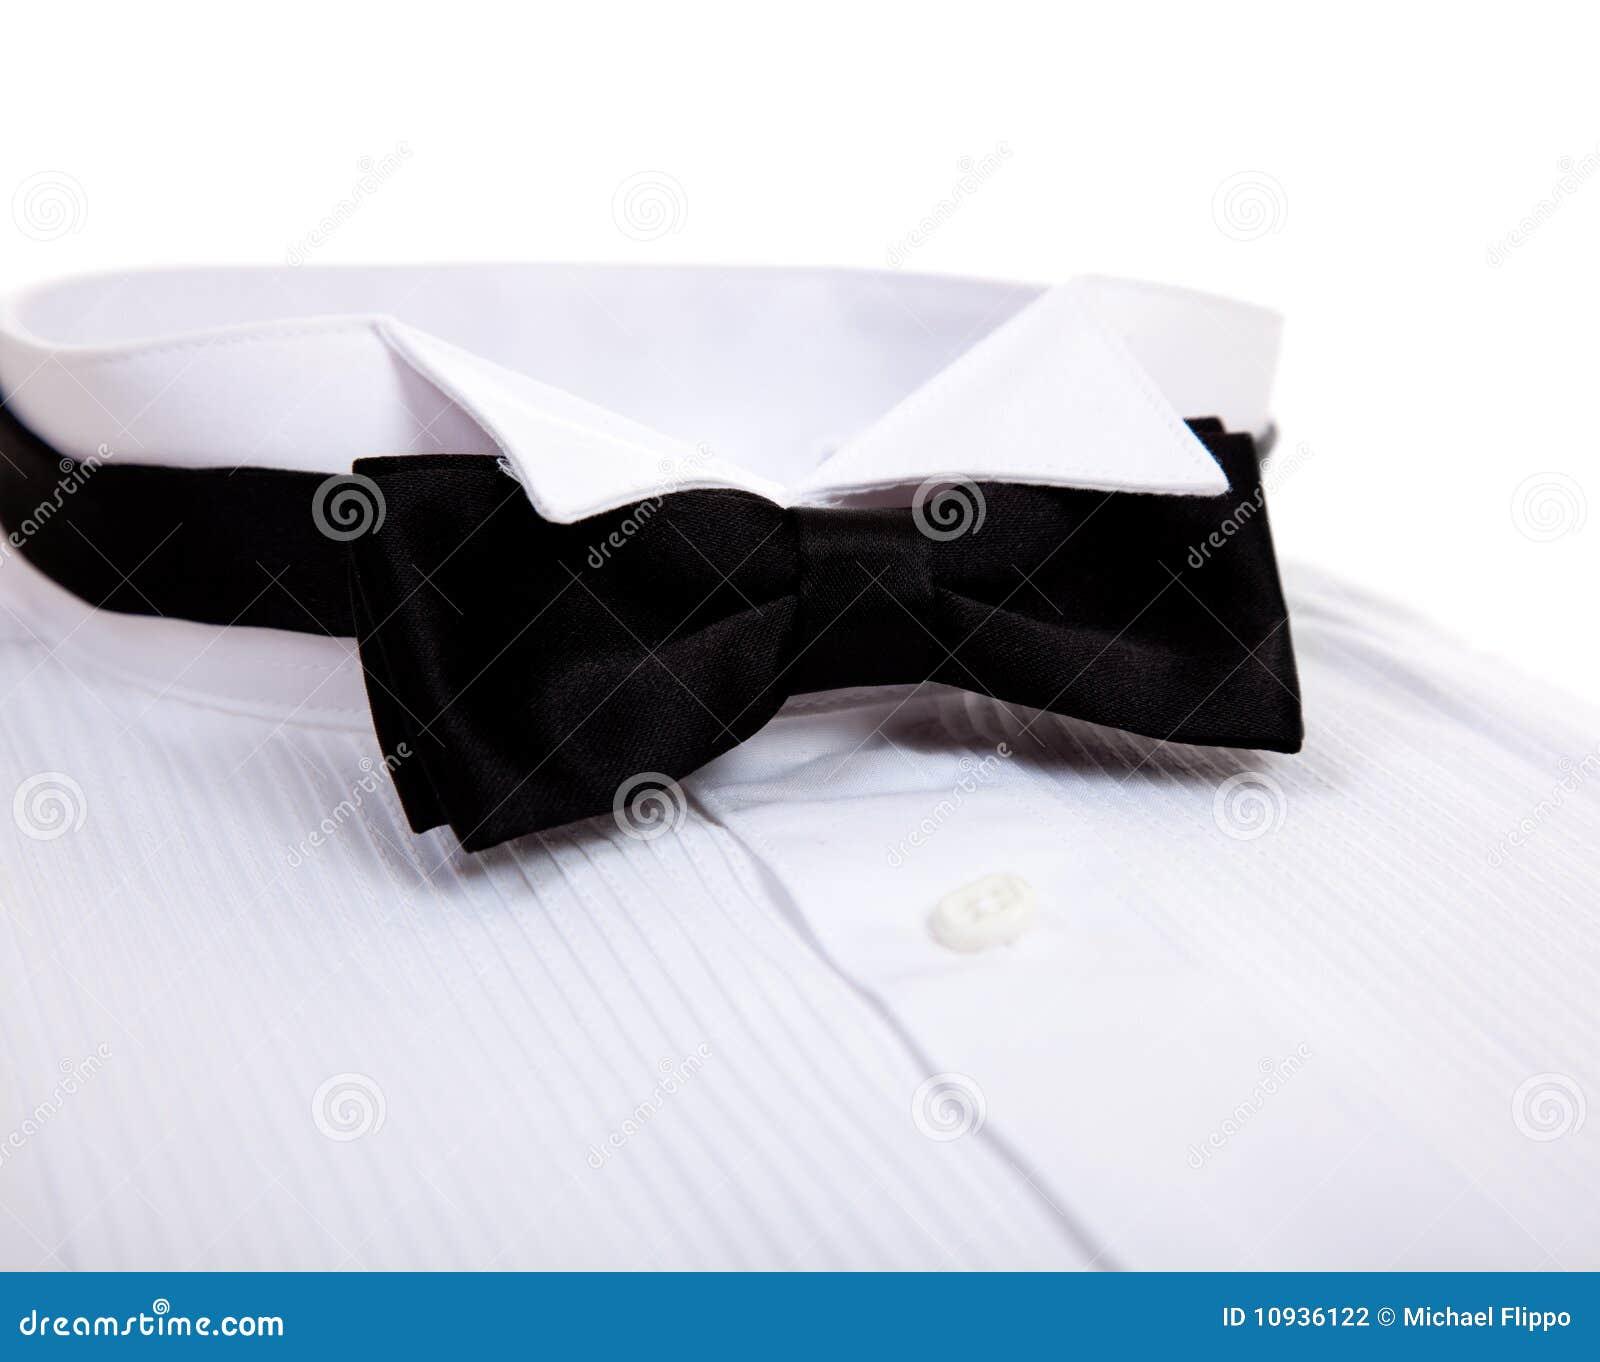 tuxedo bow tie how to put on